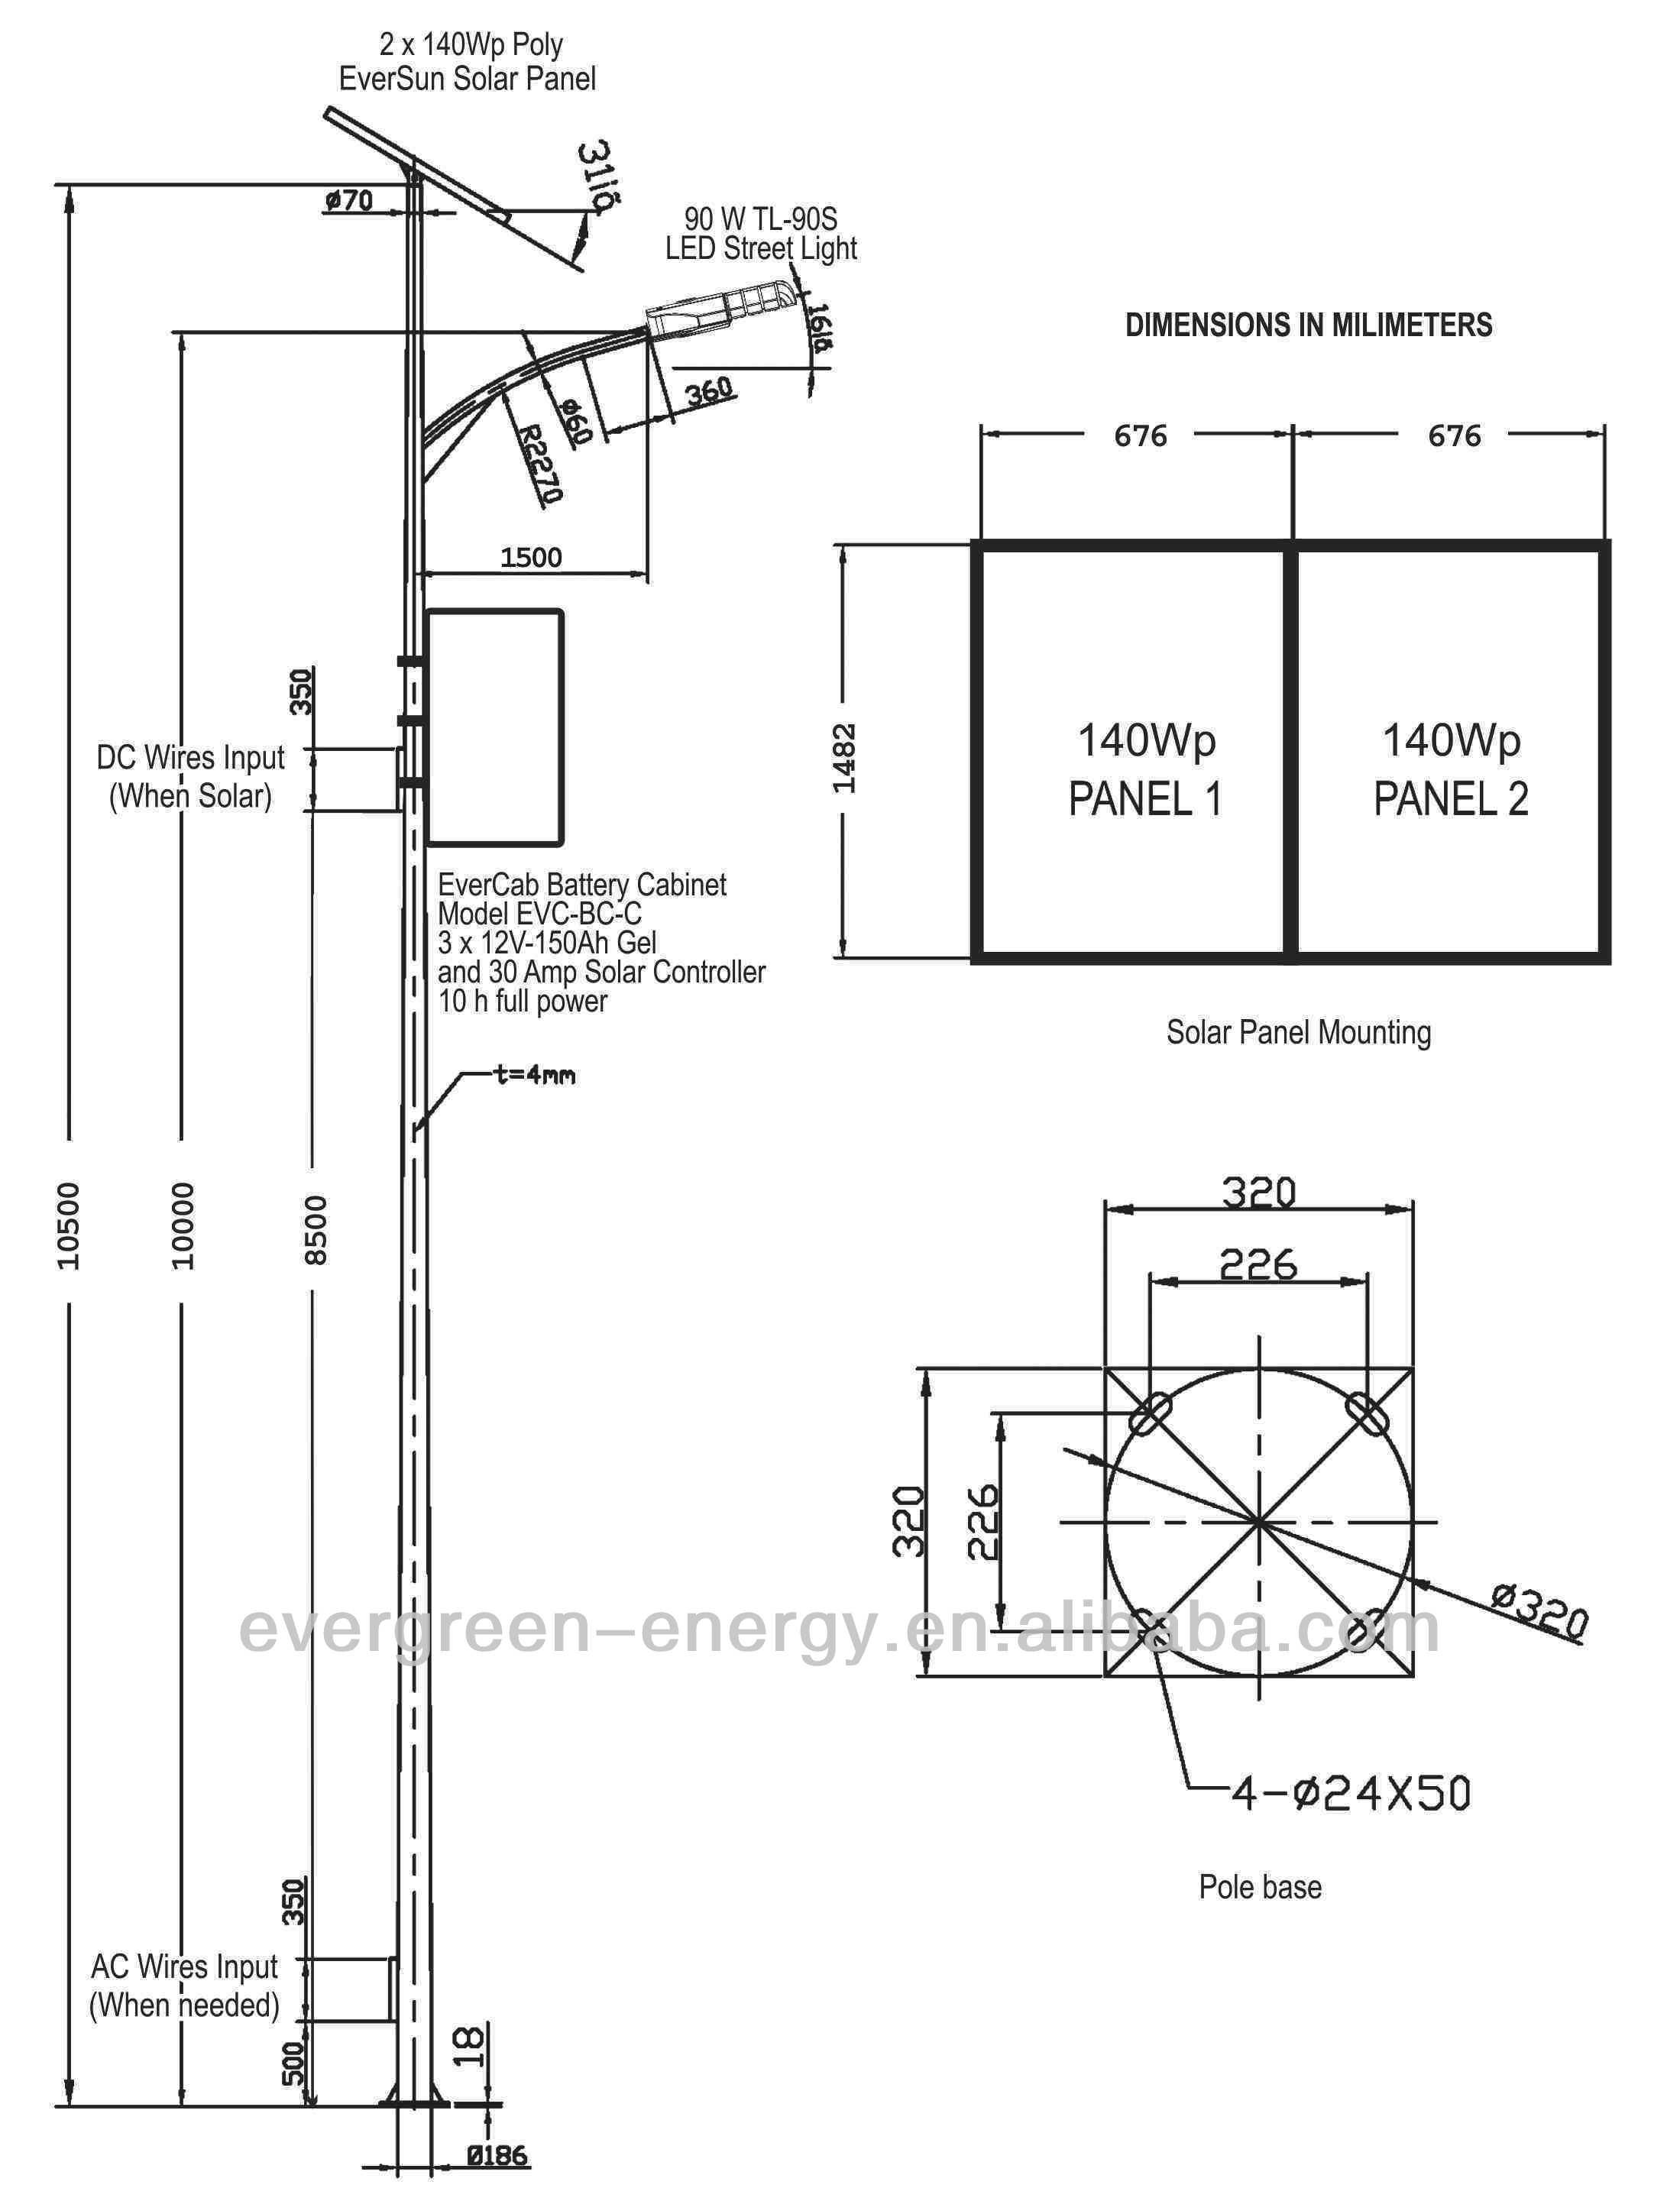 Light Poles Drawing d7 10mt Solar Led Street Light